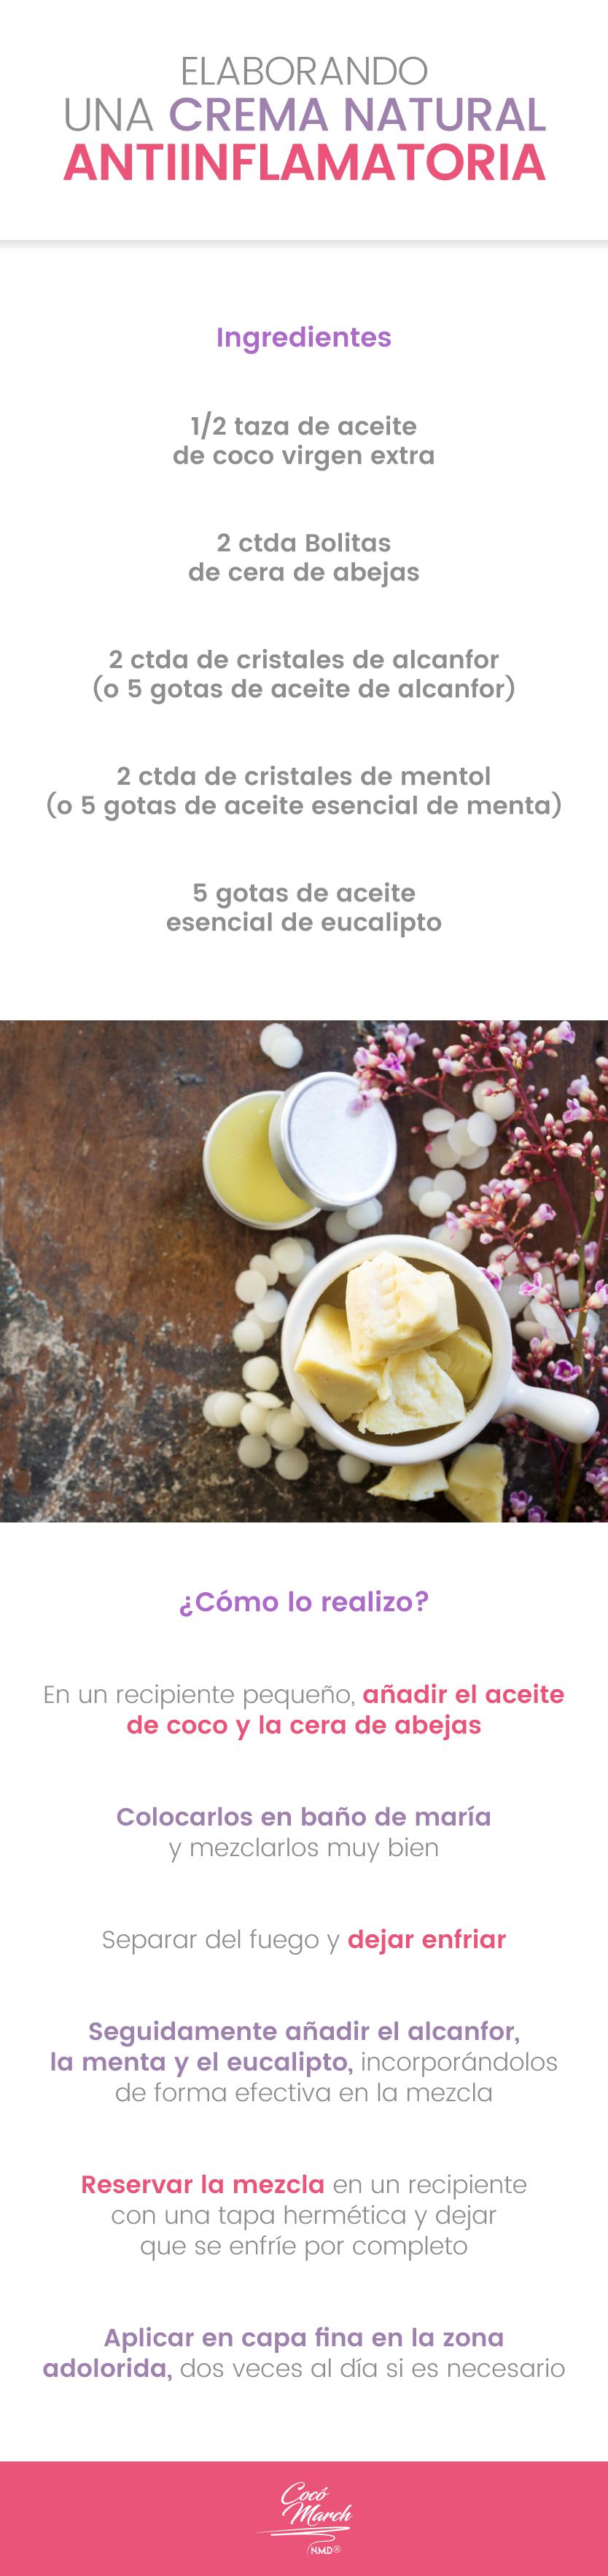 como-preparar-crema-antiinflamatoria-natural